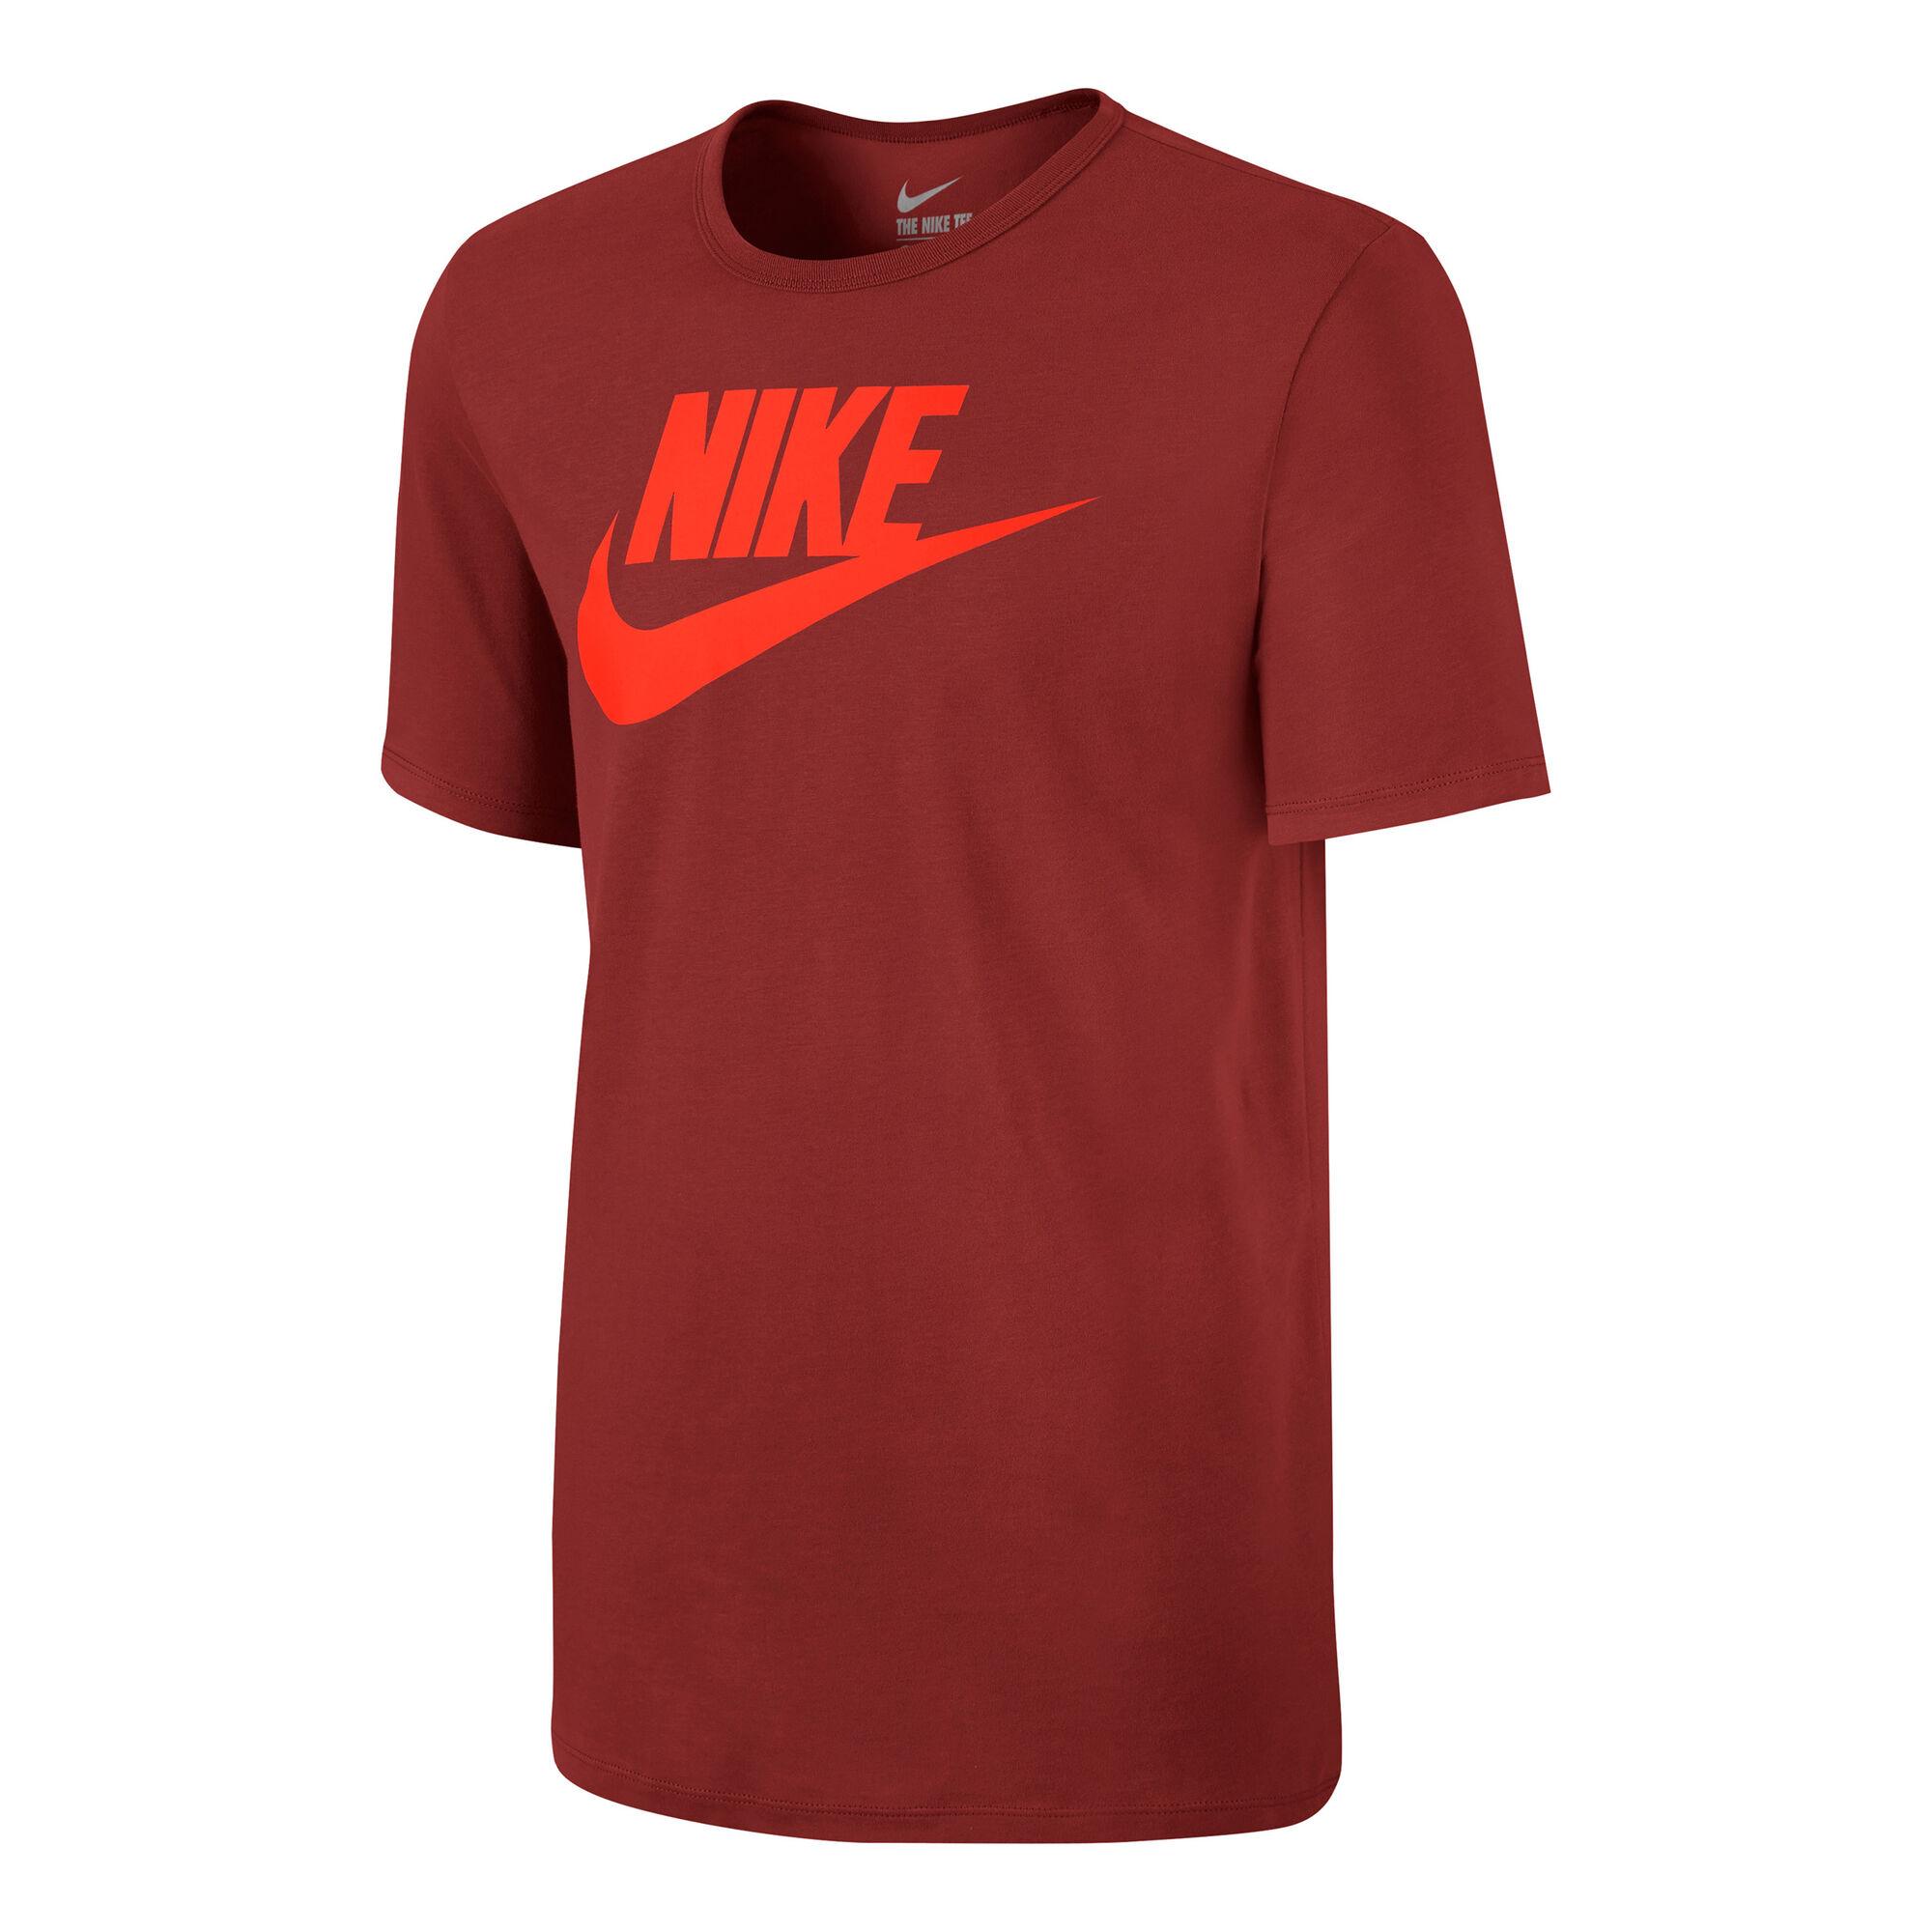 uk availability 2795a 67a49 Nike Sportswear Futura Icon T-Shirt Herren - Dunkelrot, Orange ...